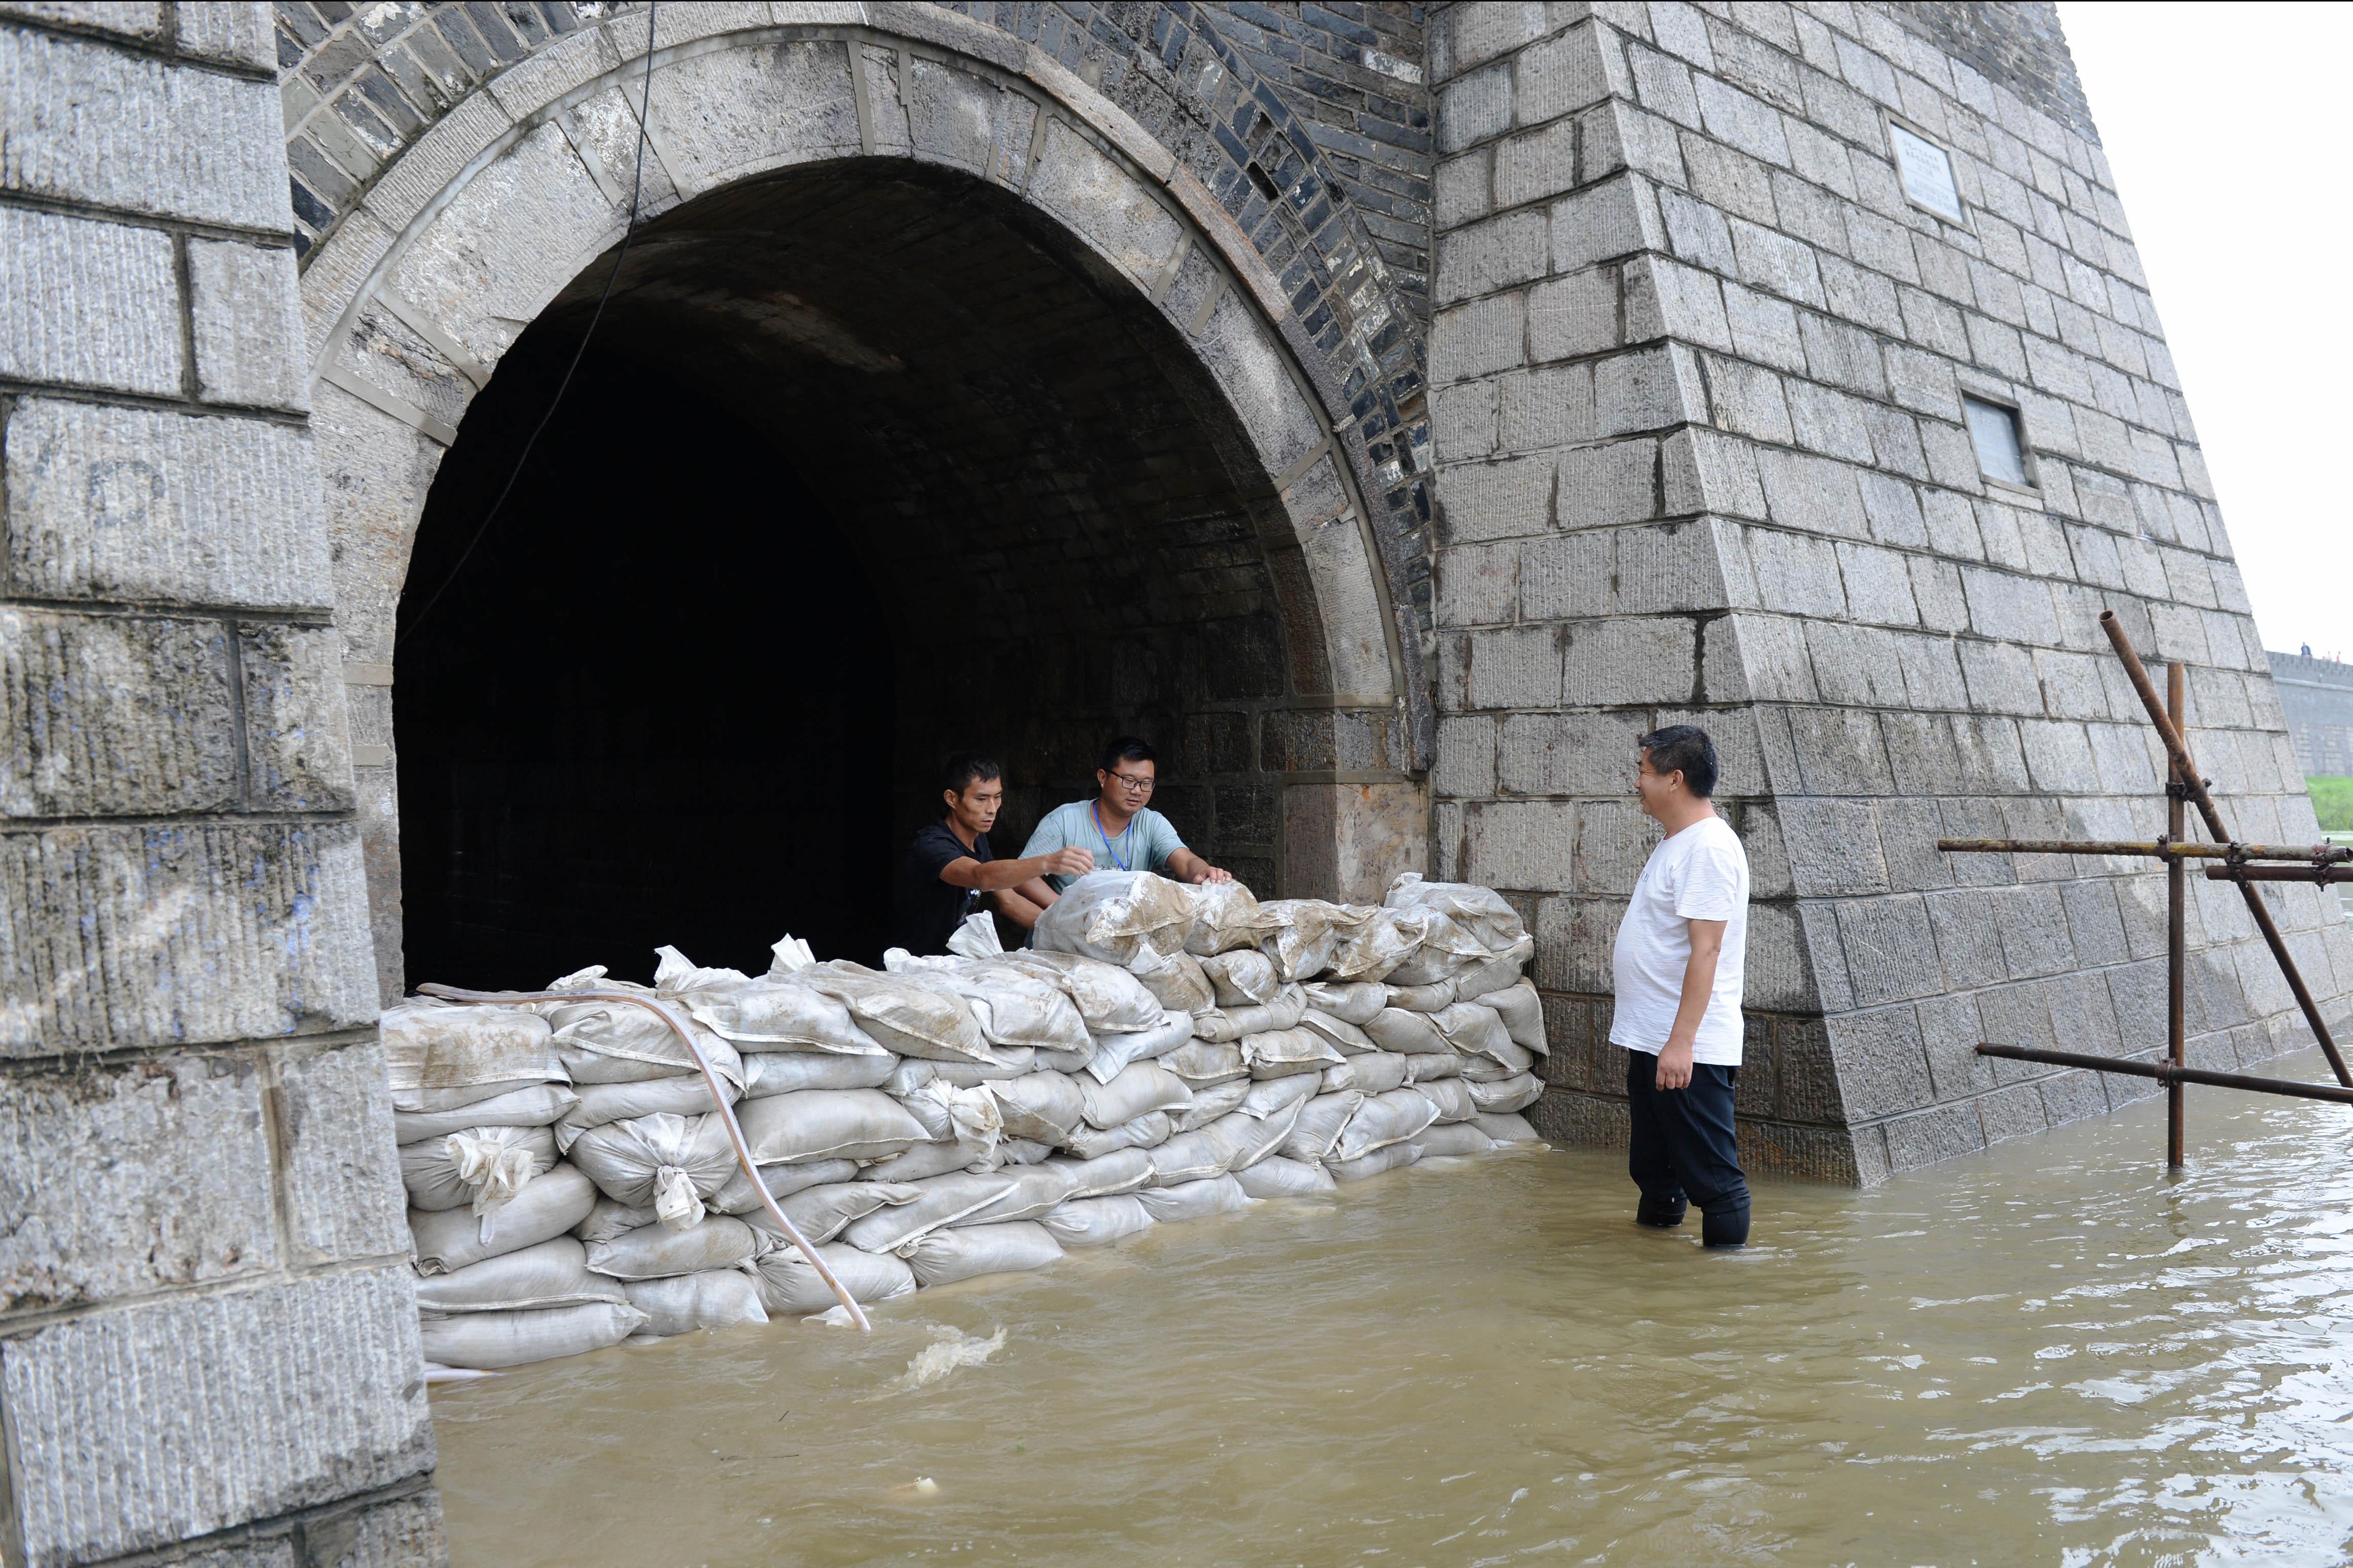 寿県古城、堀の増水で城門封鎖 安徽省淮南市